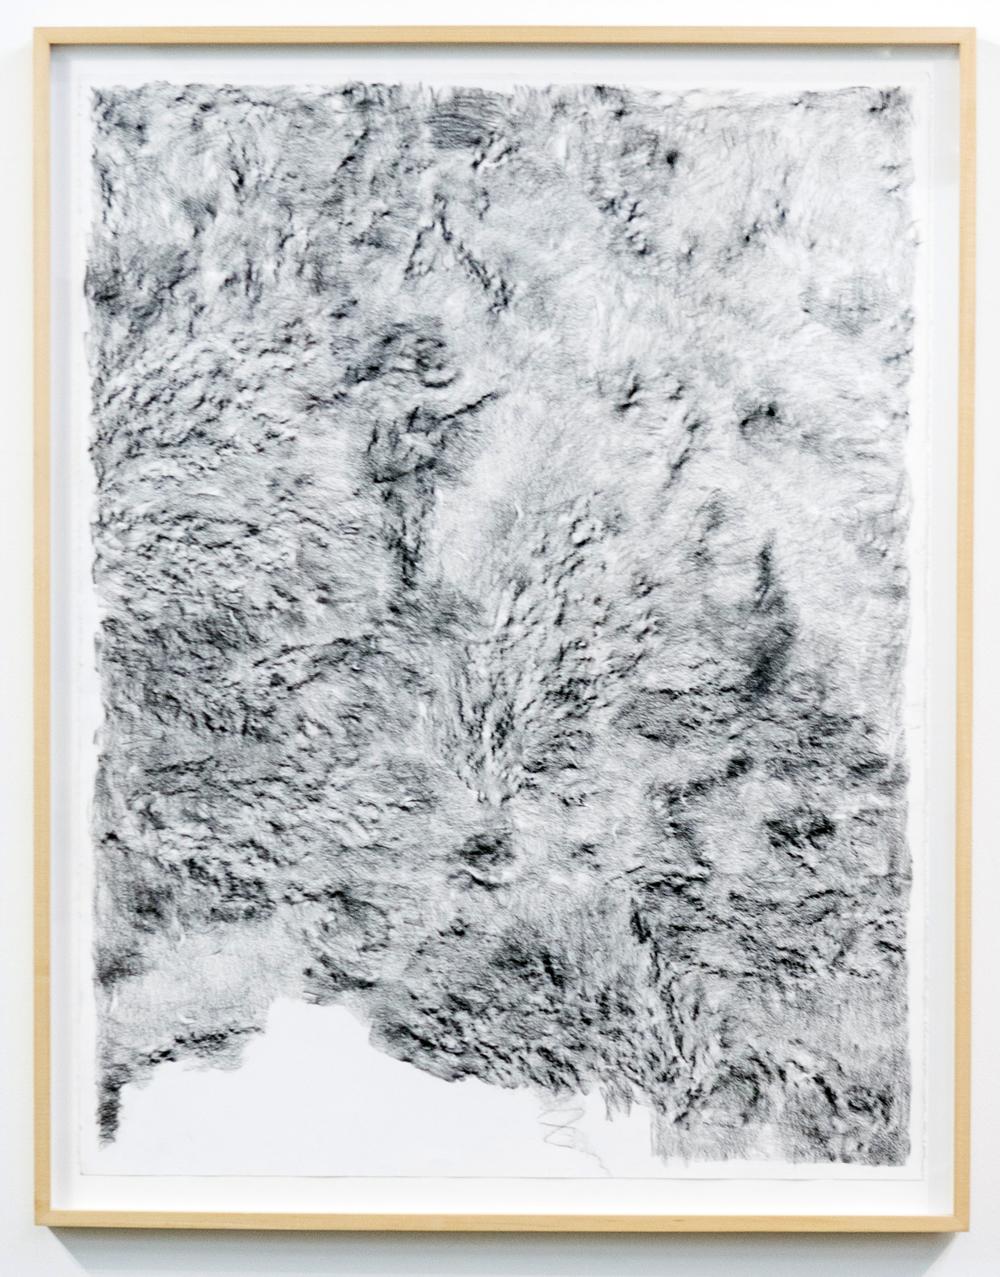 MLSL_02_ElysianPark, 2015 Conté on rag paper Paper 49.75 x 38.5 in (126.37 x 97.79 cm) Framed 52.25 x 42.5 in (132.72 x 107.95 cm)